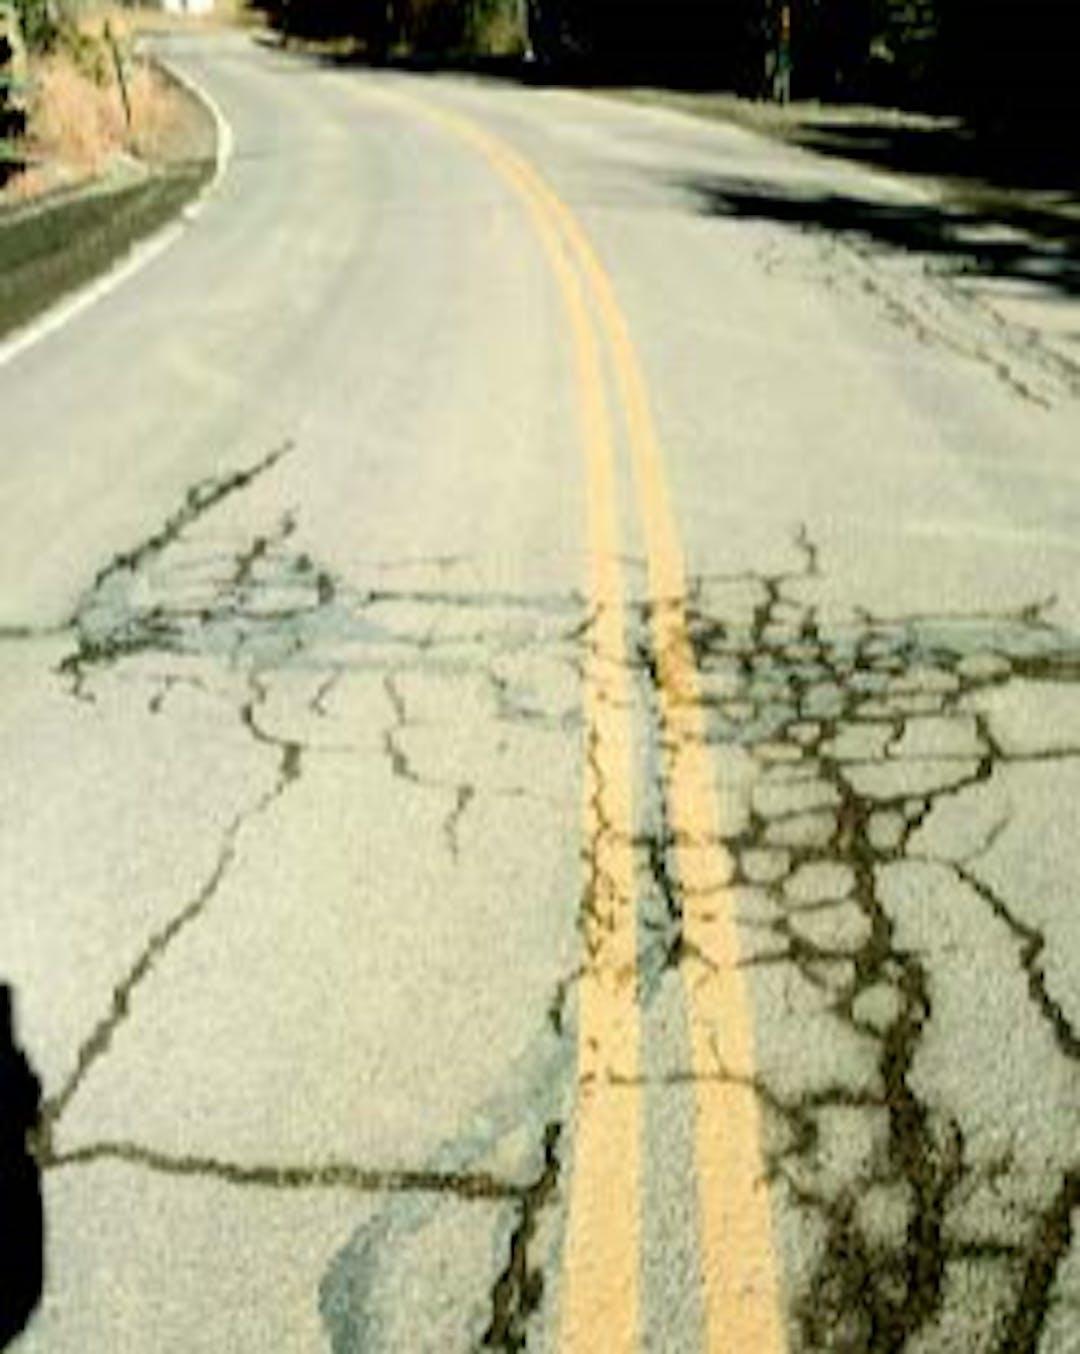 Damaged area of Soda Creek Road